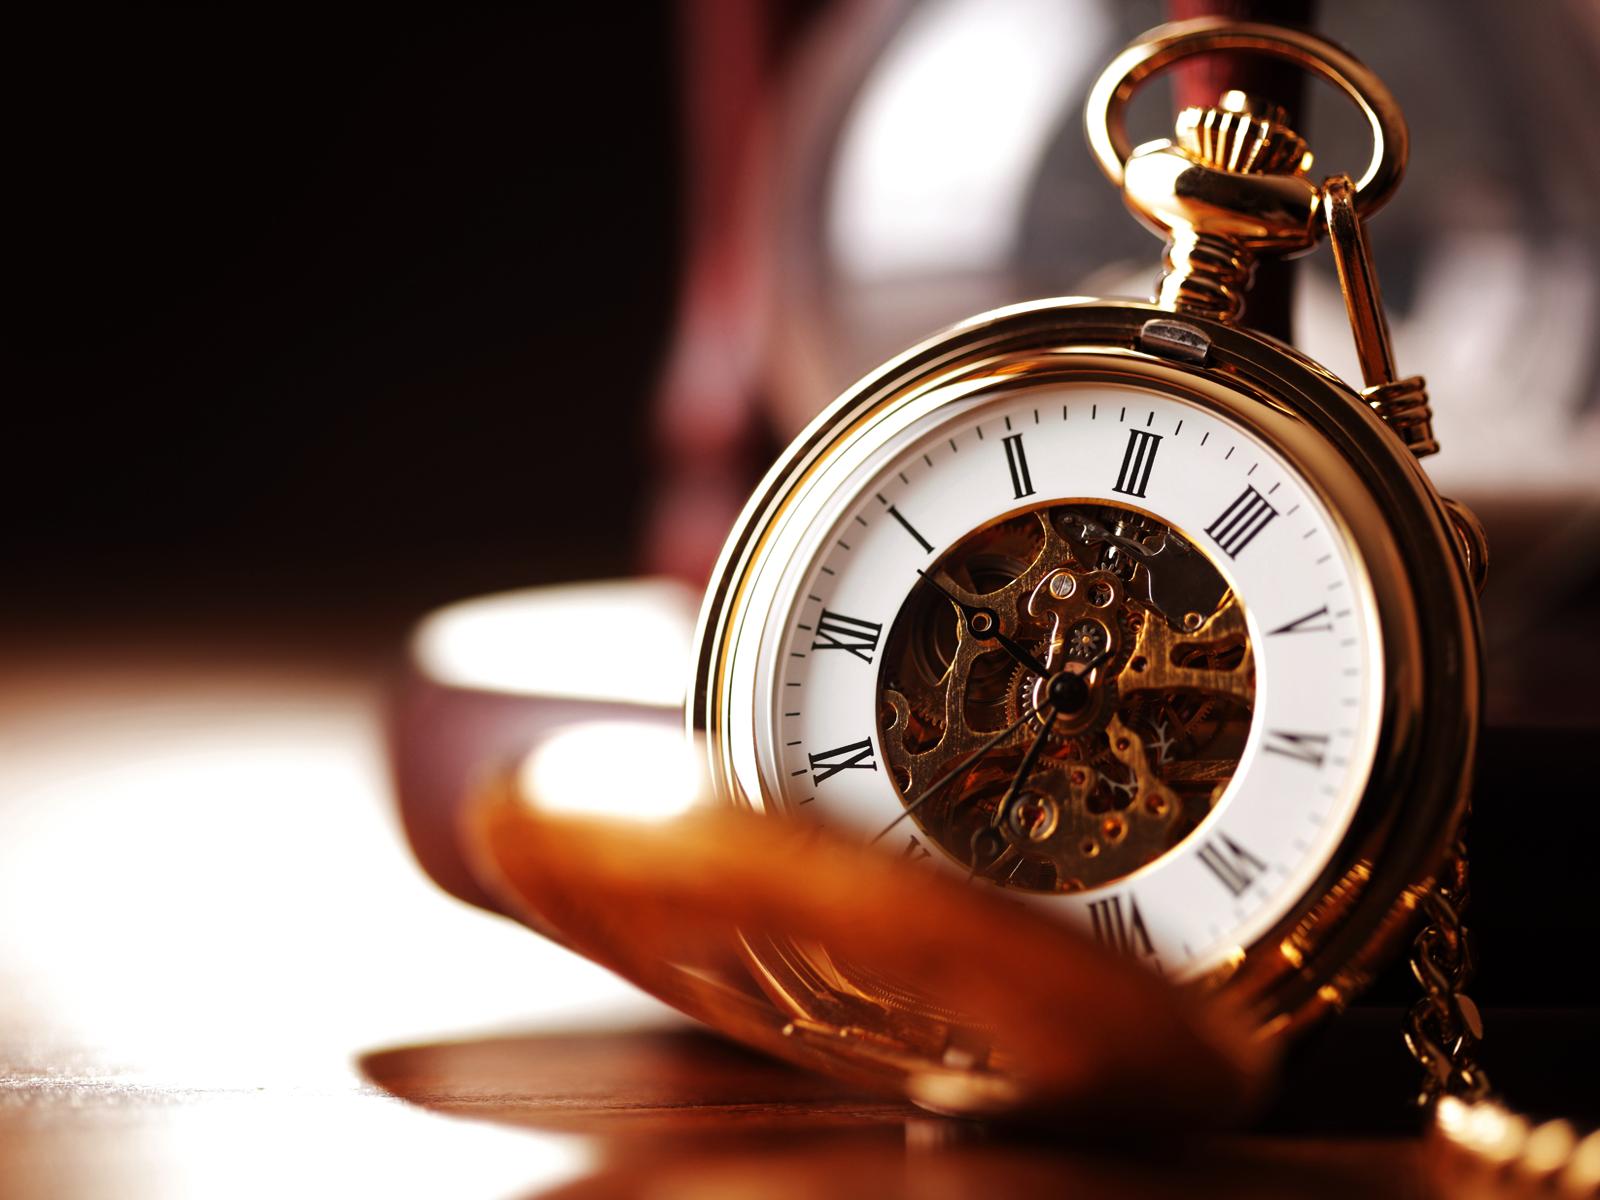 antique pocket watch wallpaper – republicans play games with s&p, Innenarchitektur ideen